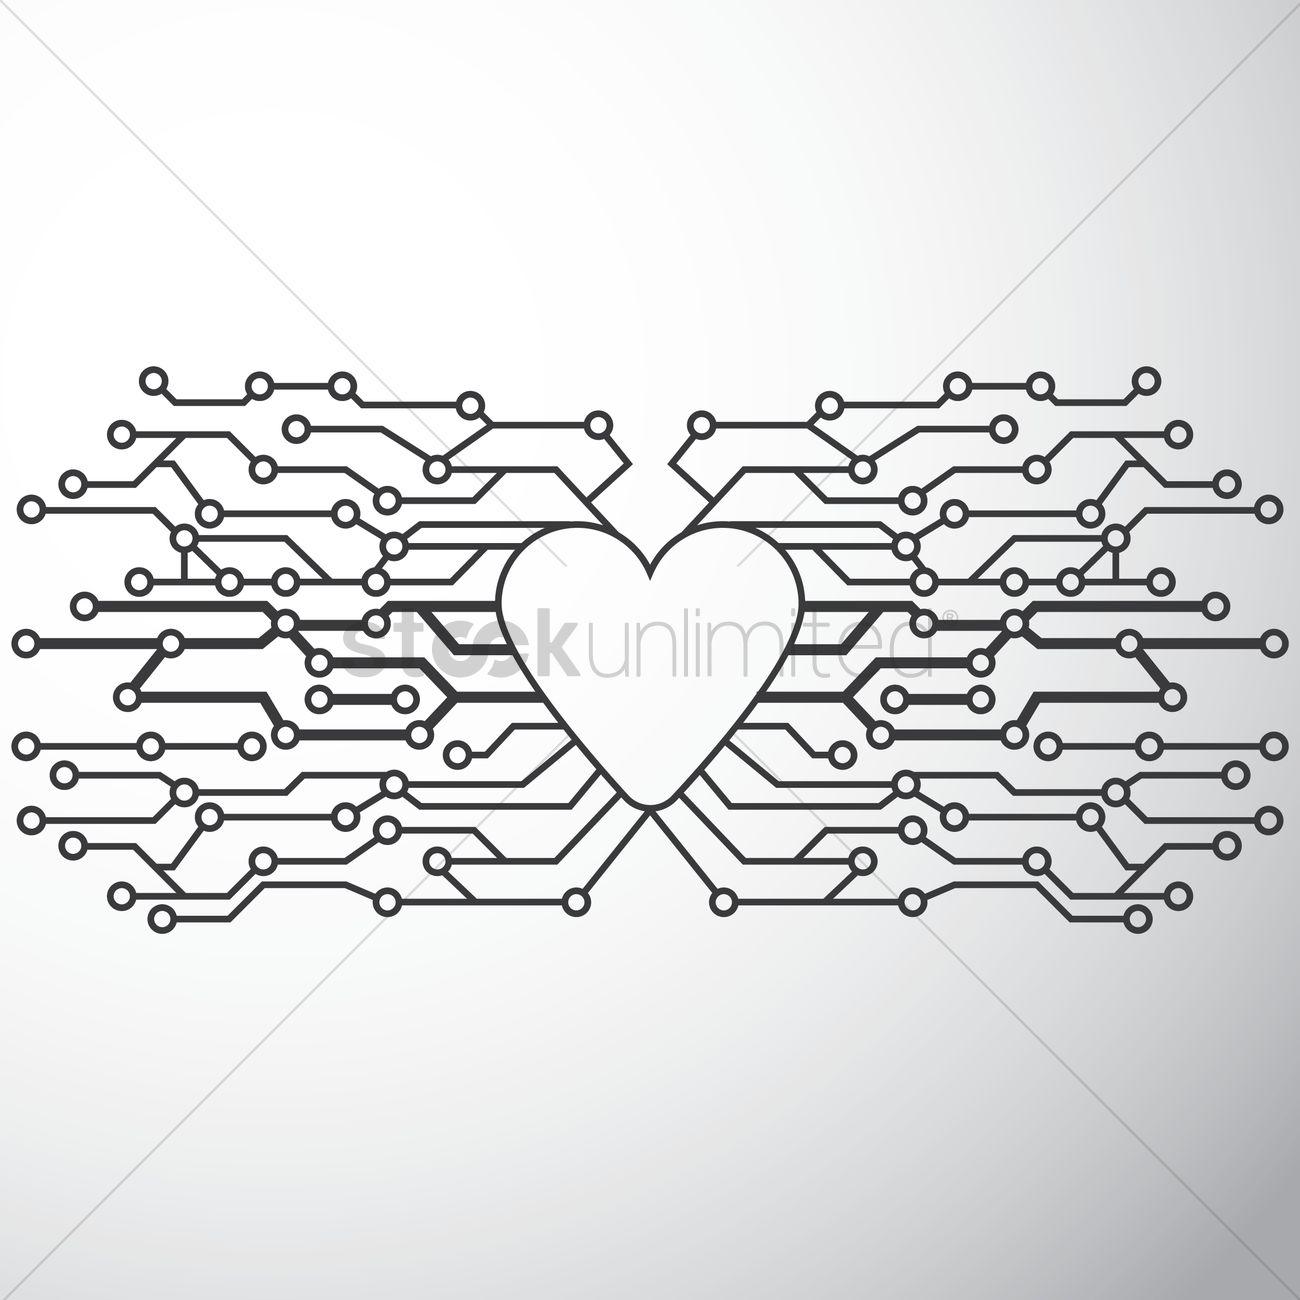 Heart shape circuit design Vector Image - 1648496 | StockUnlimited